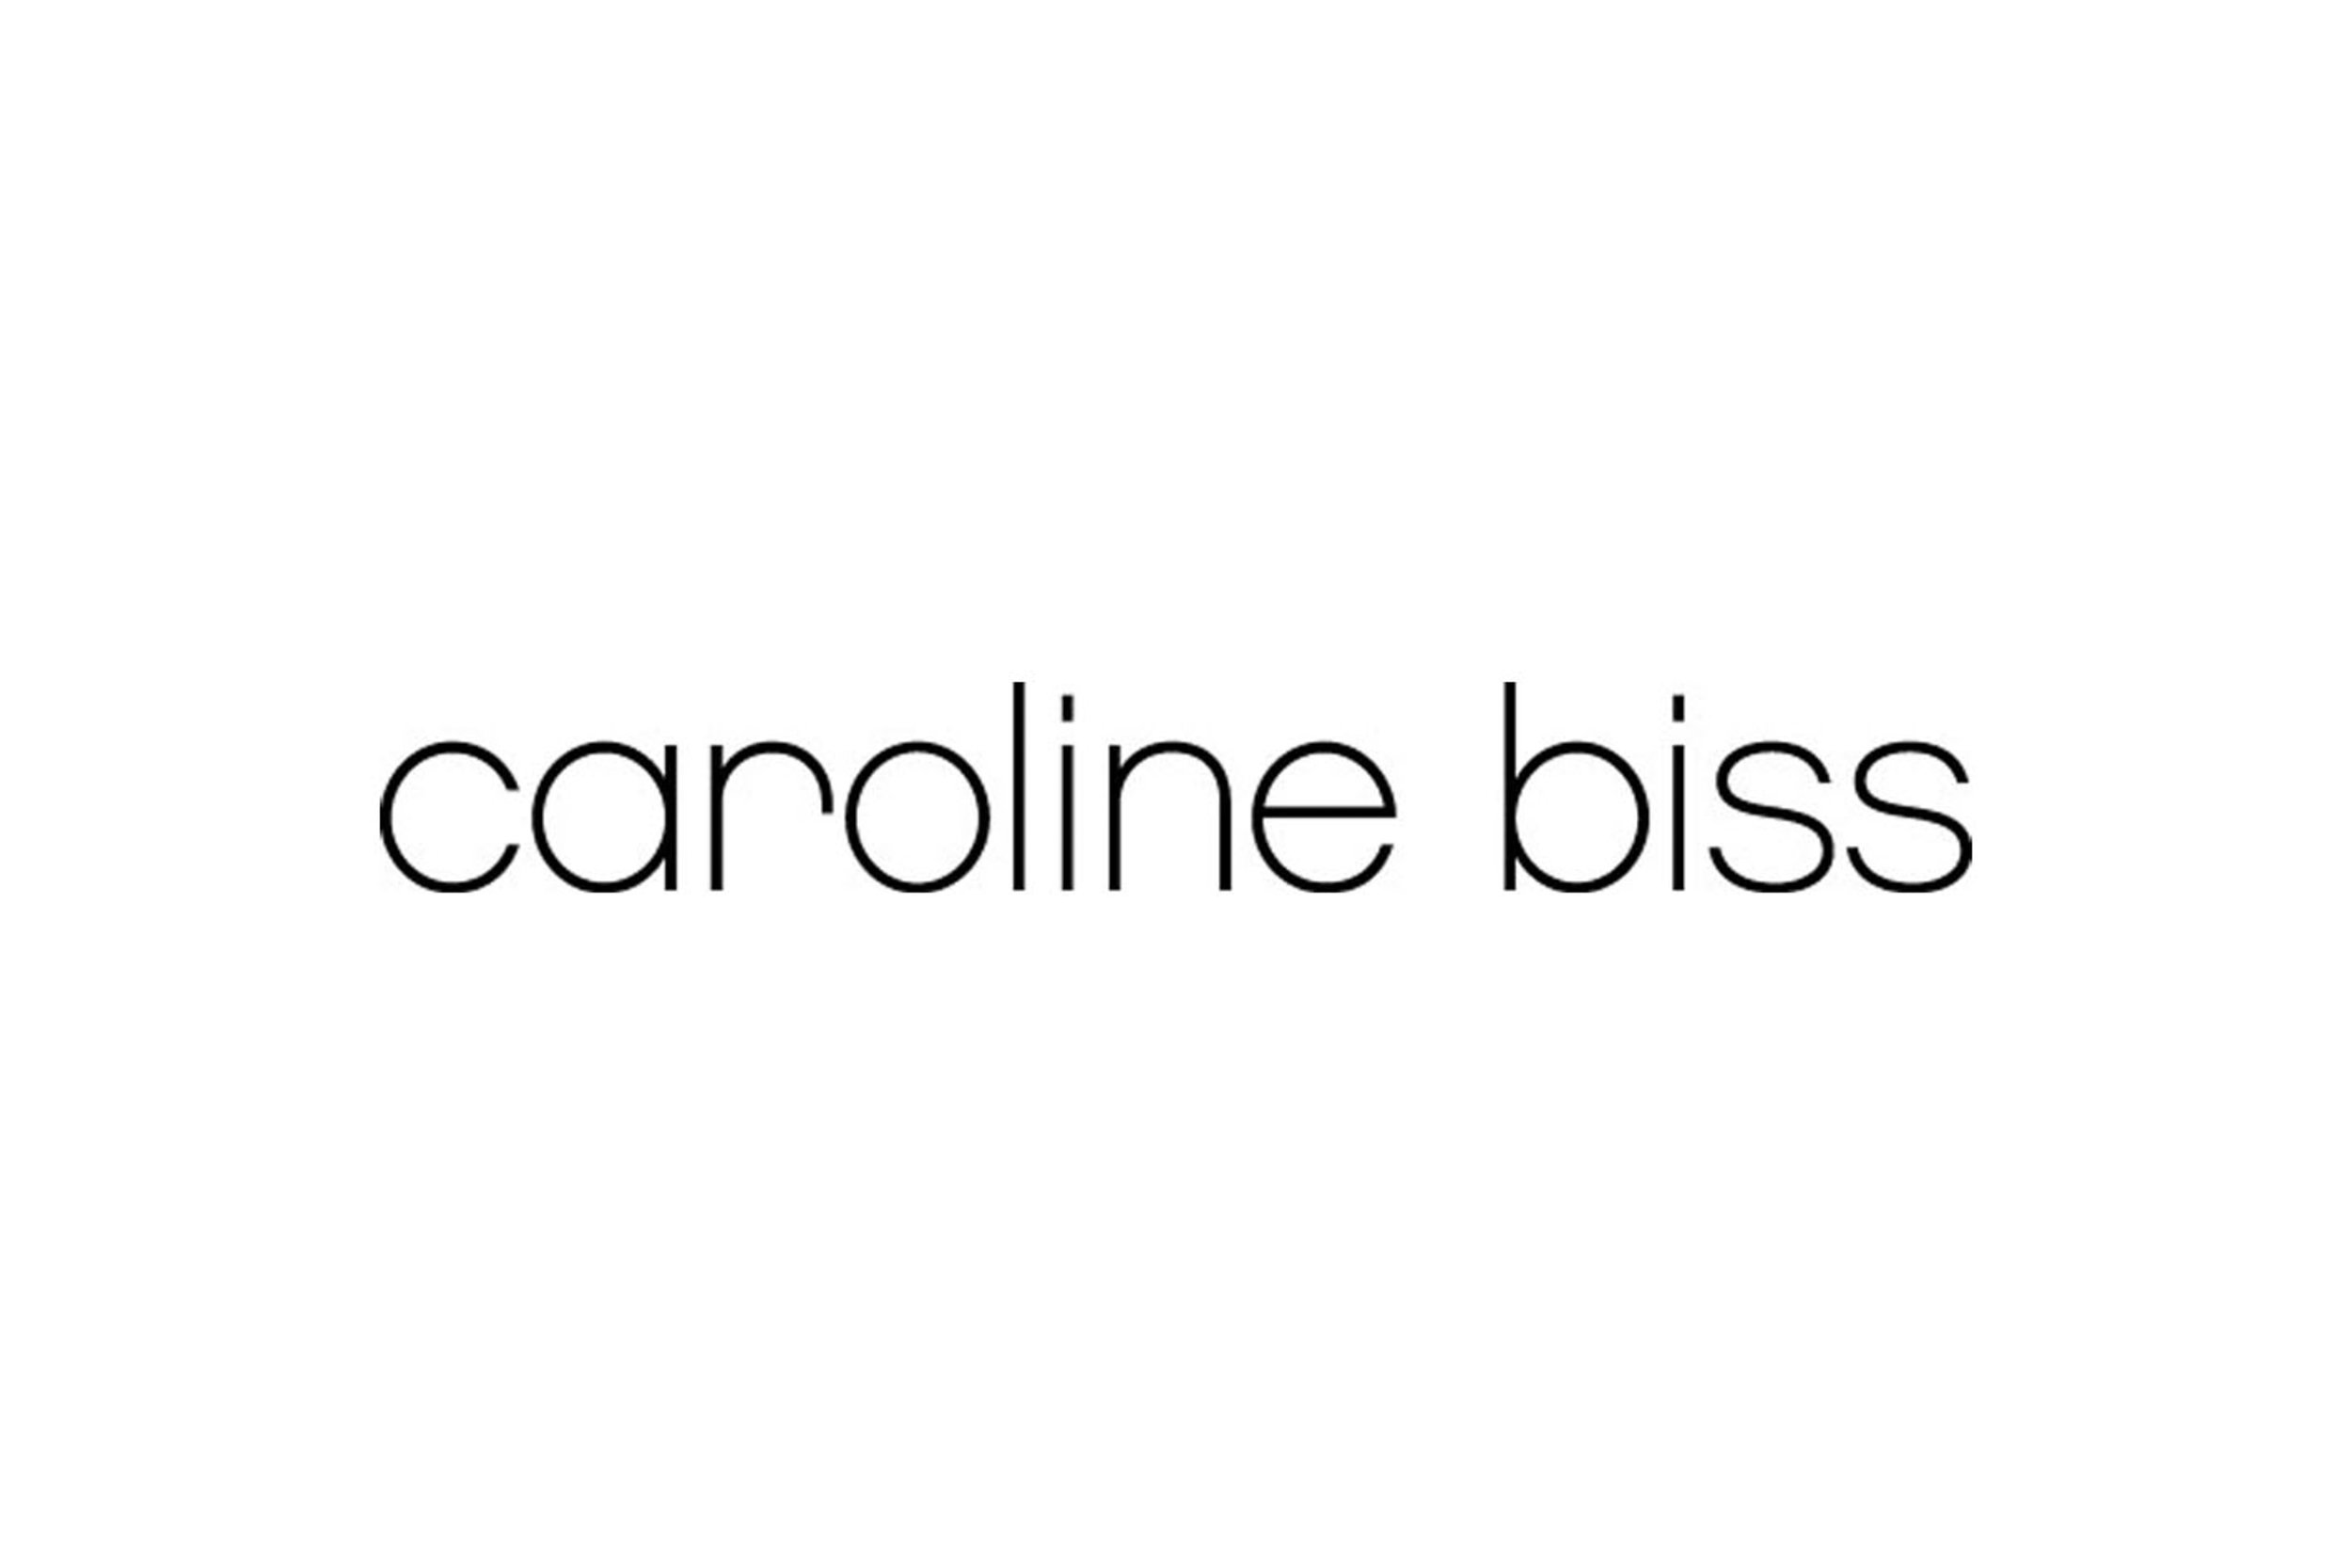 LOGO CAROLINE BISS BLACK_WHITE BACKGROUND.jpg